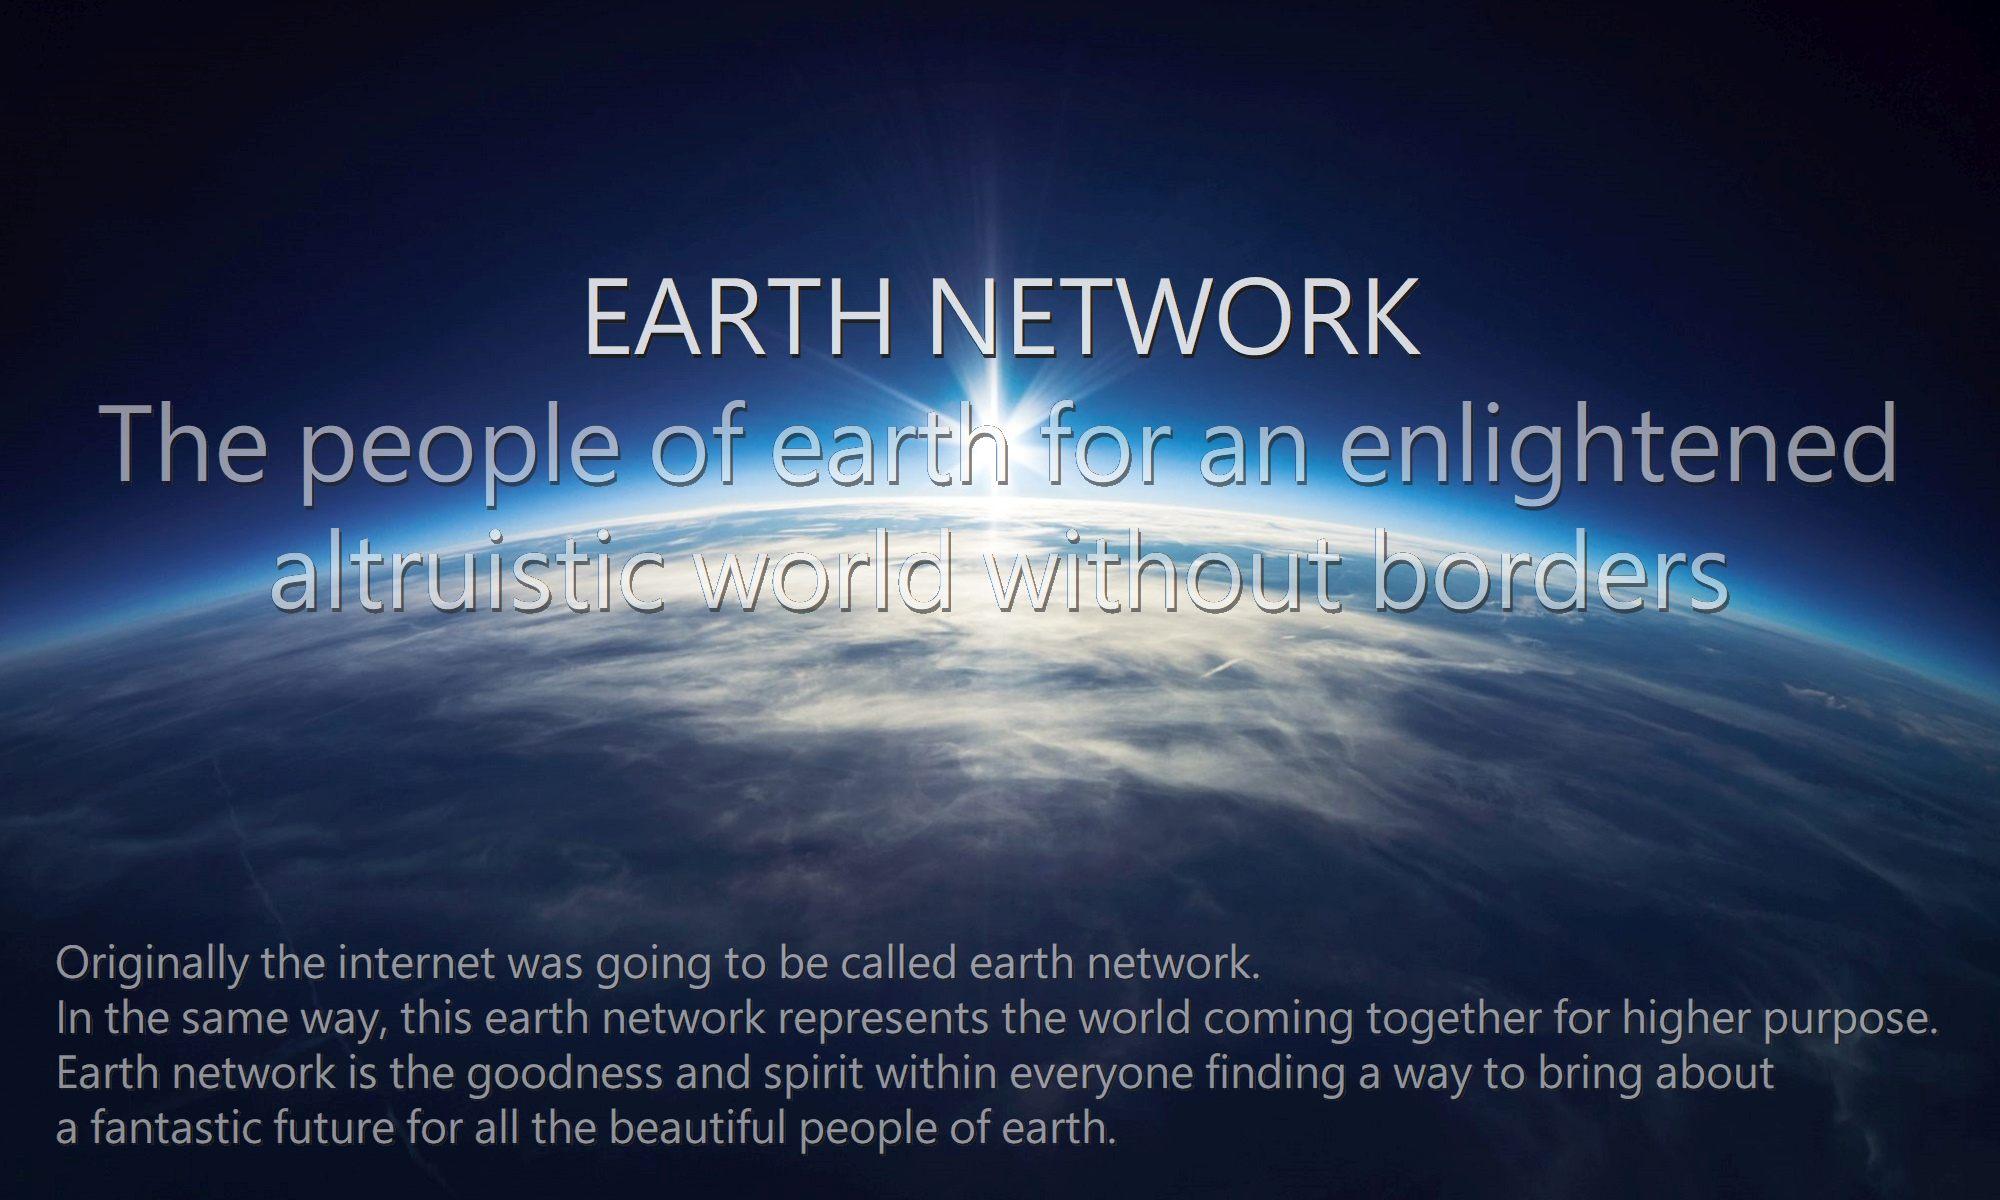 worthy-of-charity-help-humanity-best-good-philanthropy-help-mankind-people